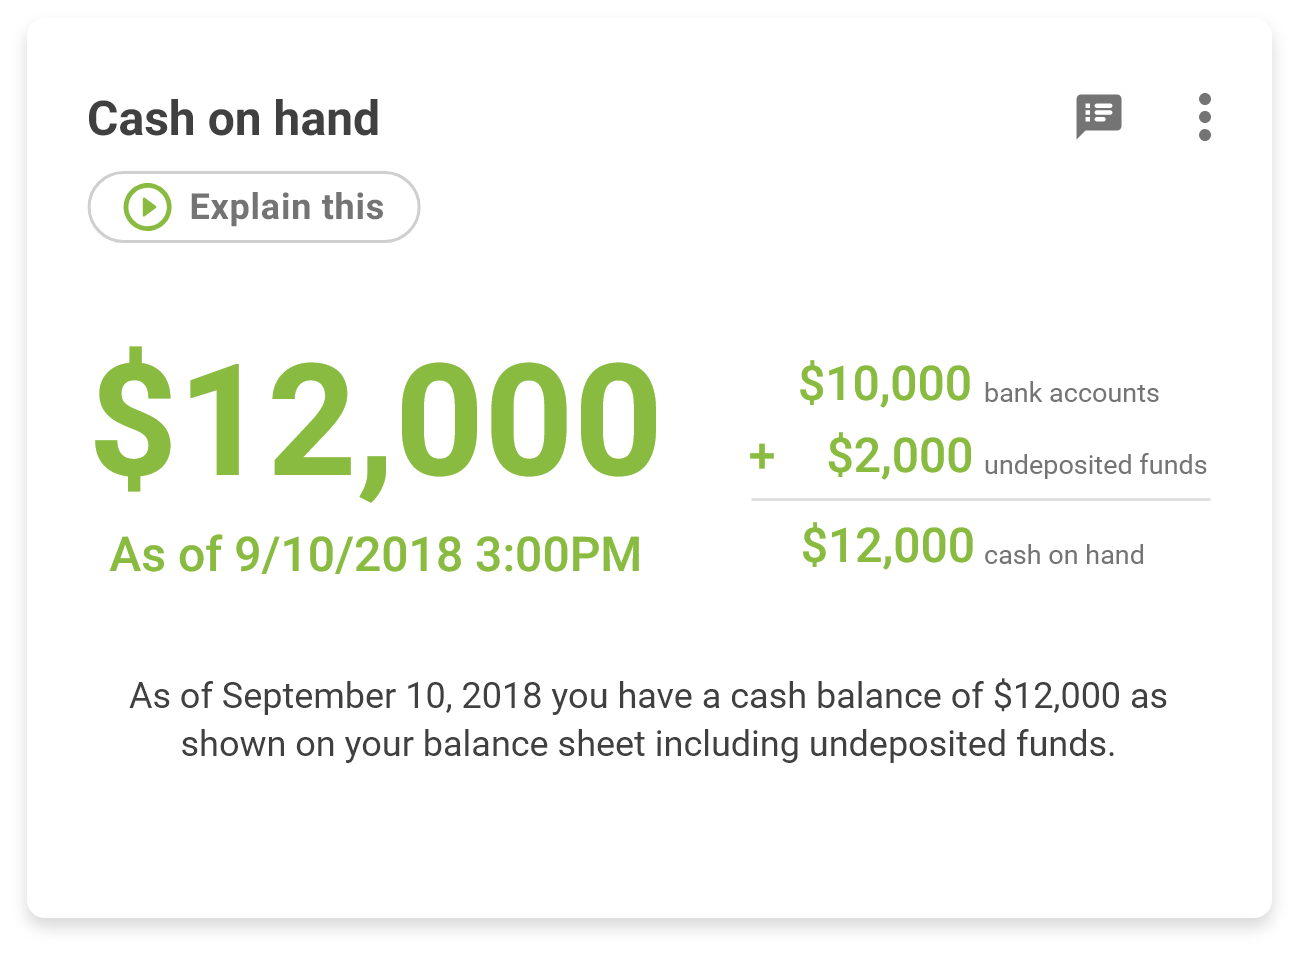 Cash on hand@3x